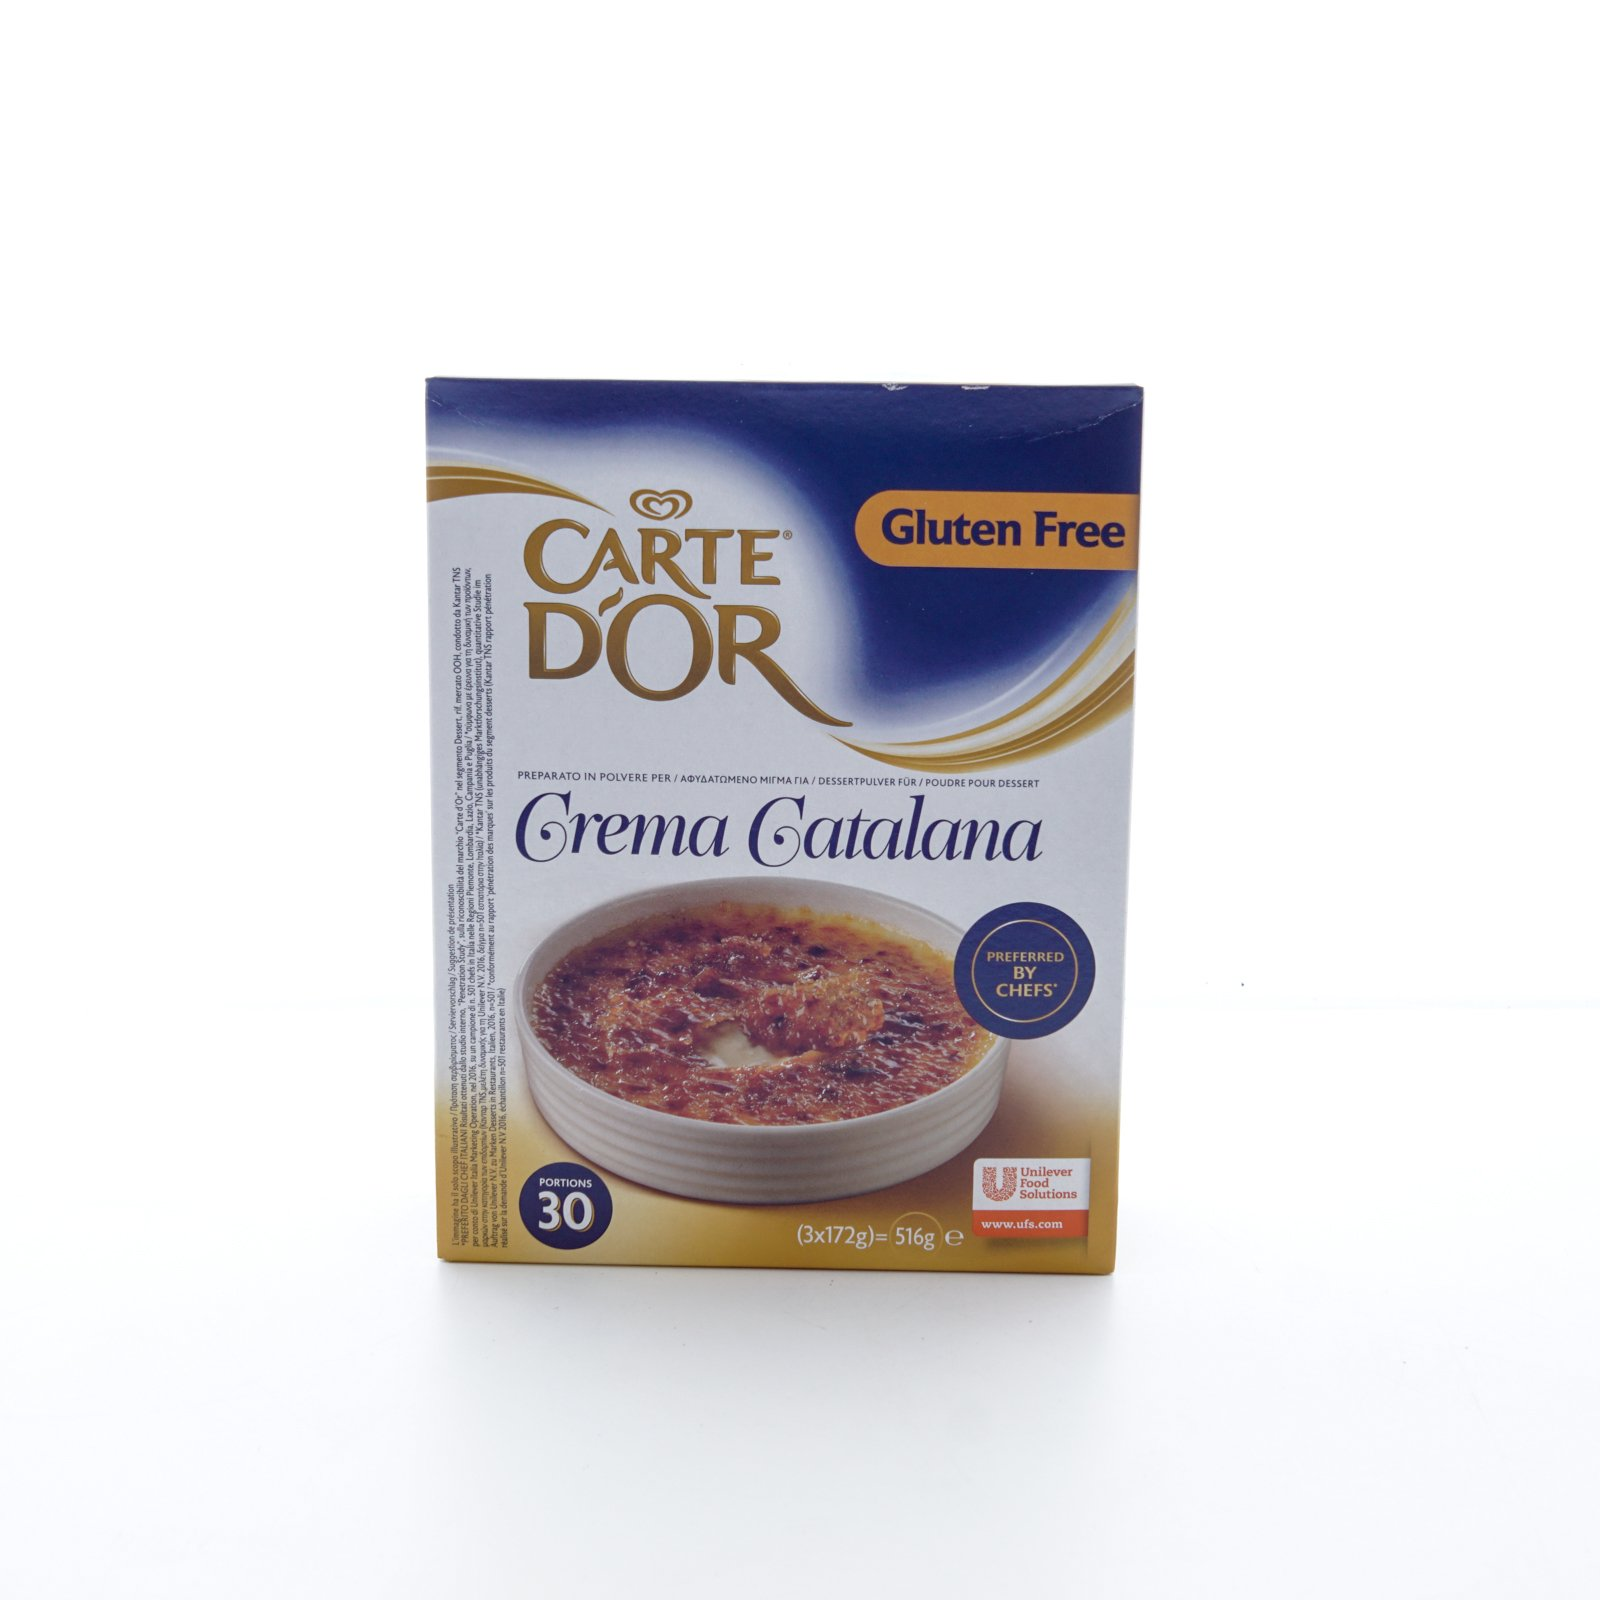 CARTE D'OR – CREMA CATALANA GR.516